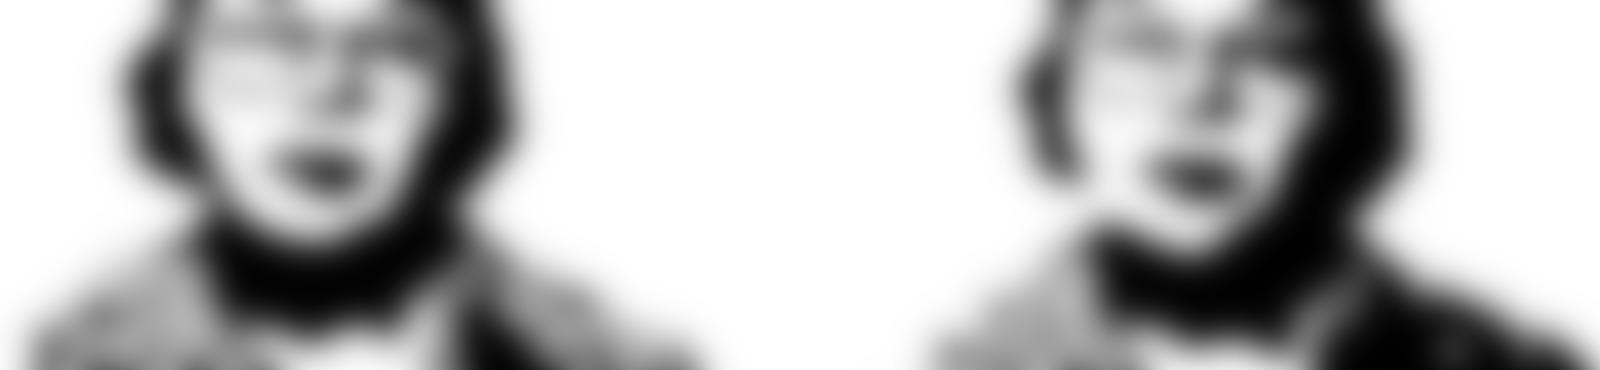 Blurred logo ilseserika